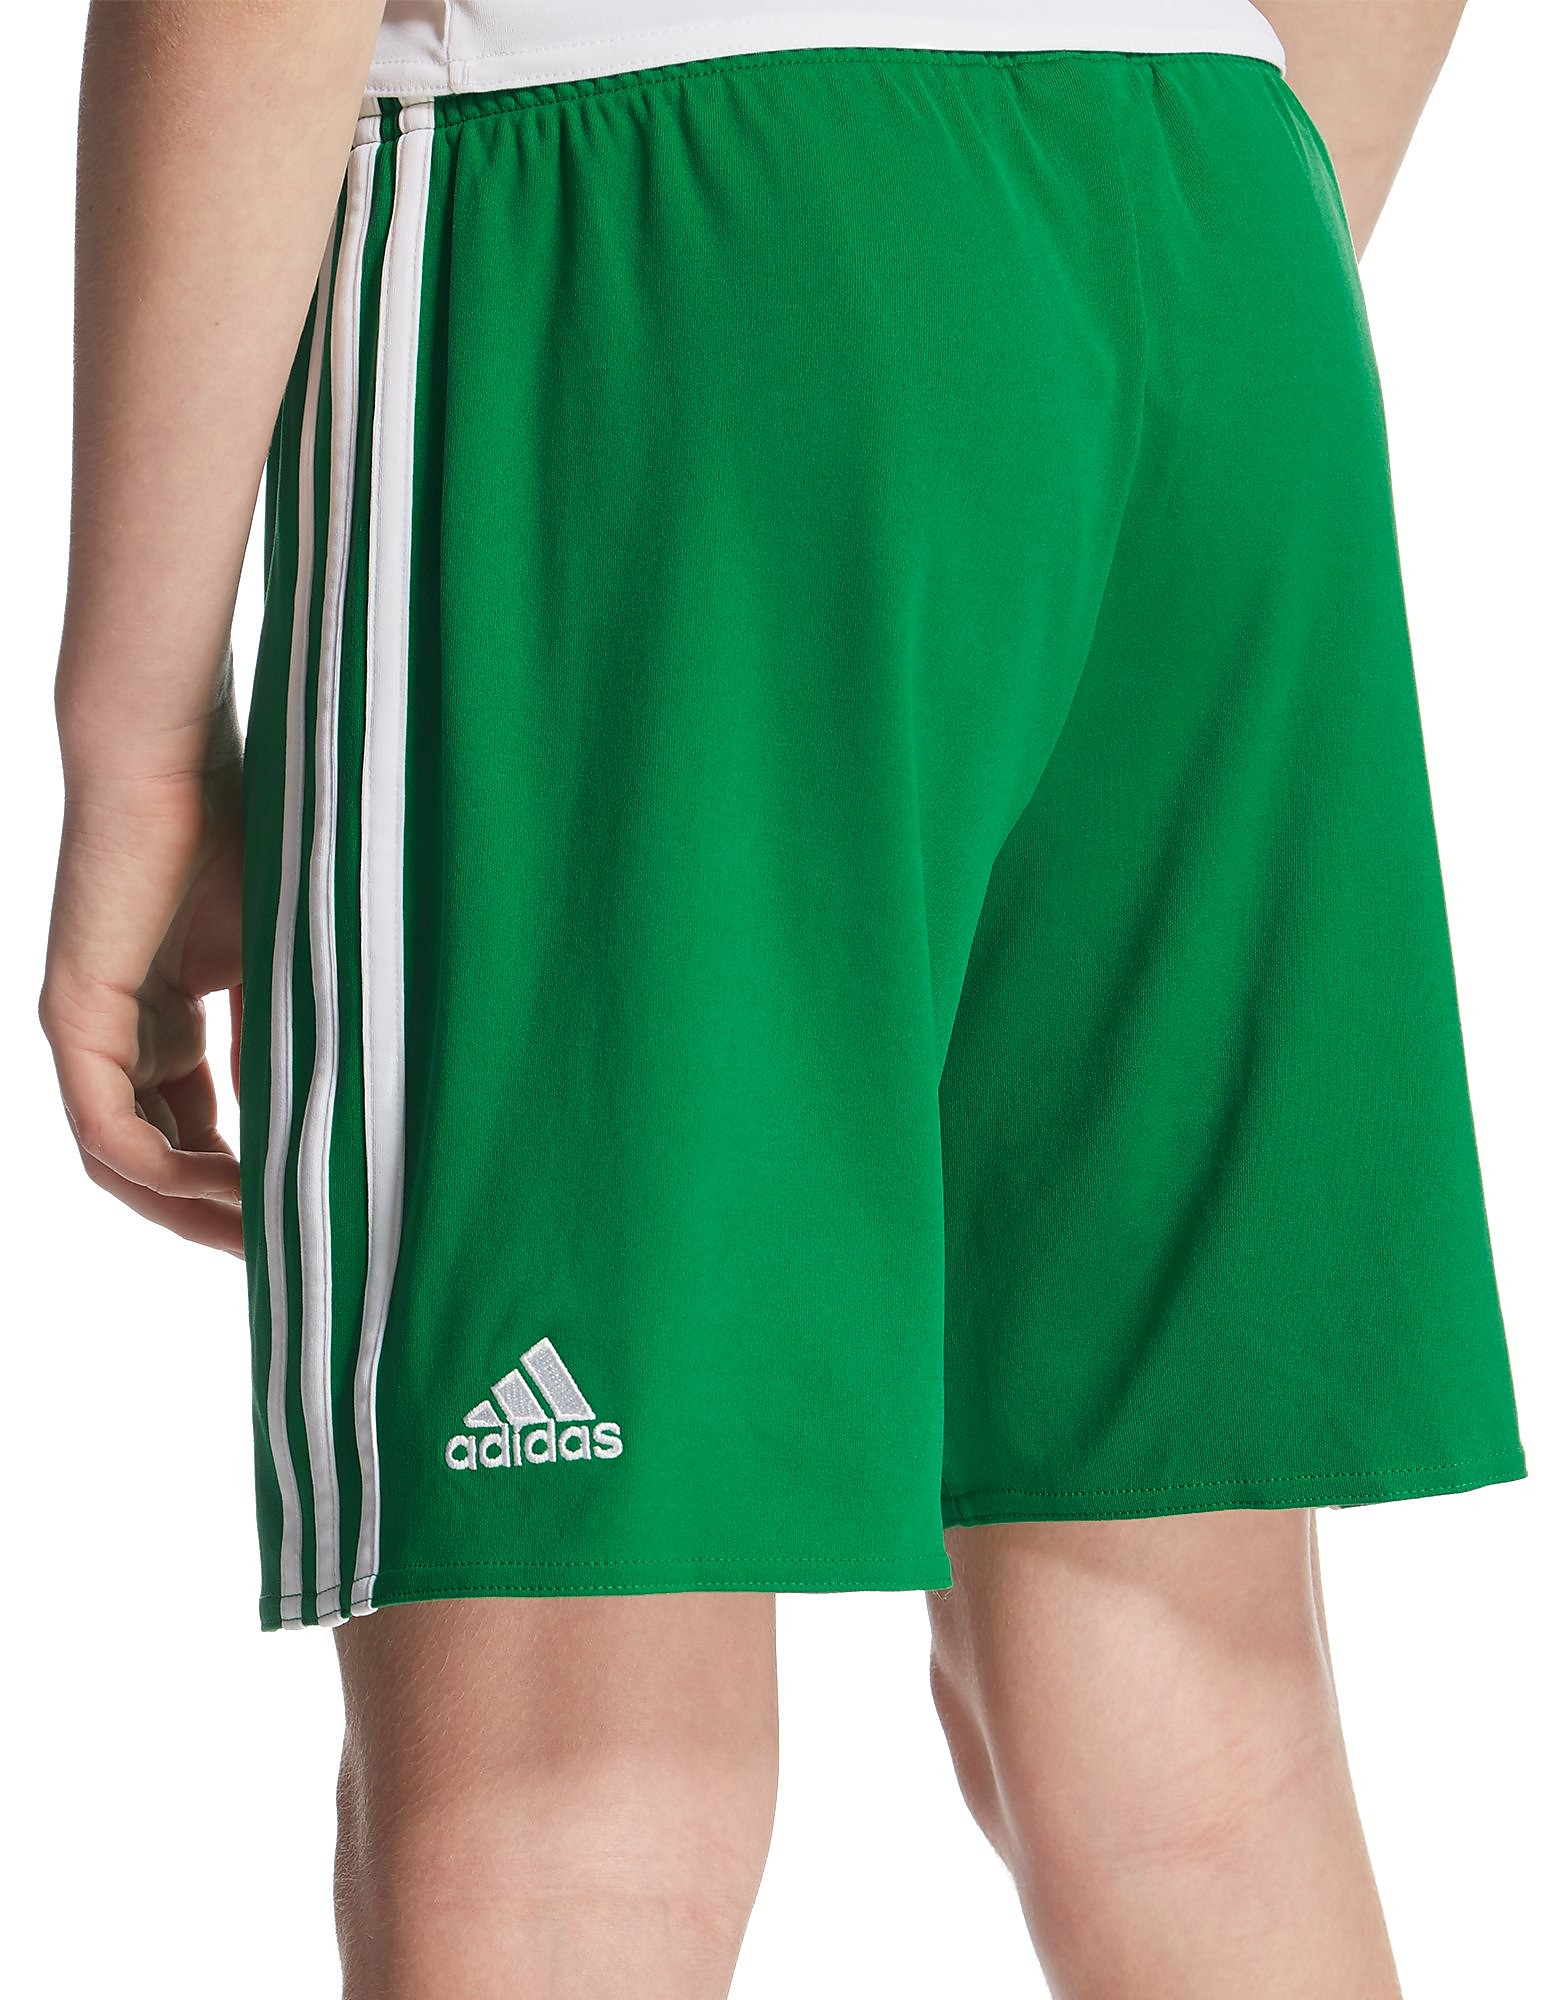 adidas Northern Ireland 2016 Away Shorts Junior